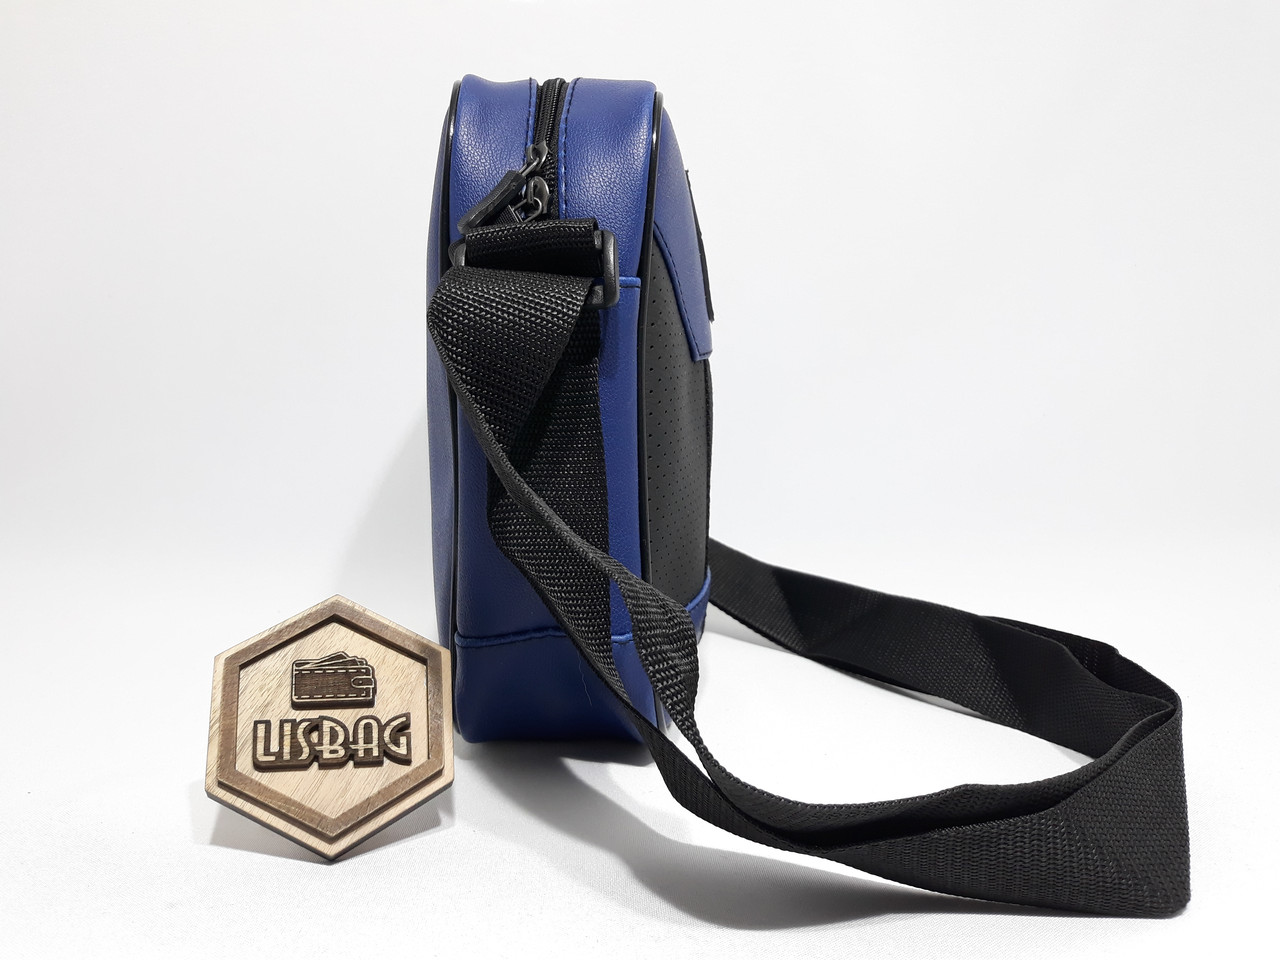 19e1effbfdd4 Мужская сумка Puma ferrari Синяя на каждый день реплика люкс качества 2х  компонентная кожа PU, цена 239 грн., купить в Умани — Prom.ua (ID#779051232)